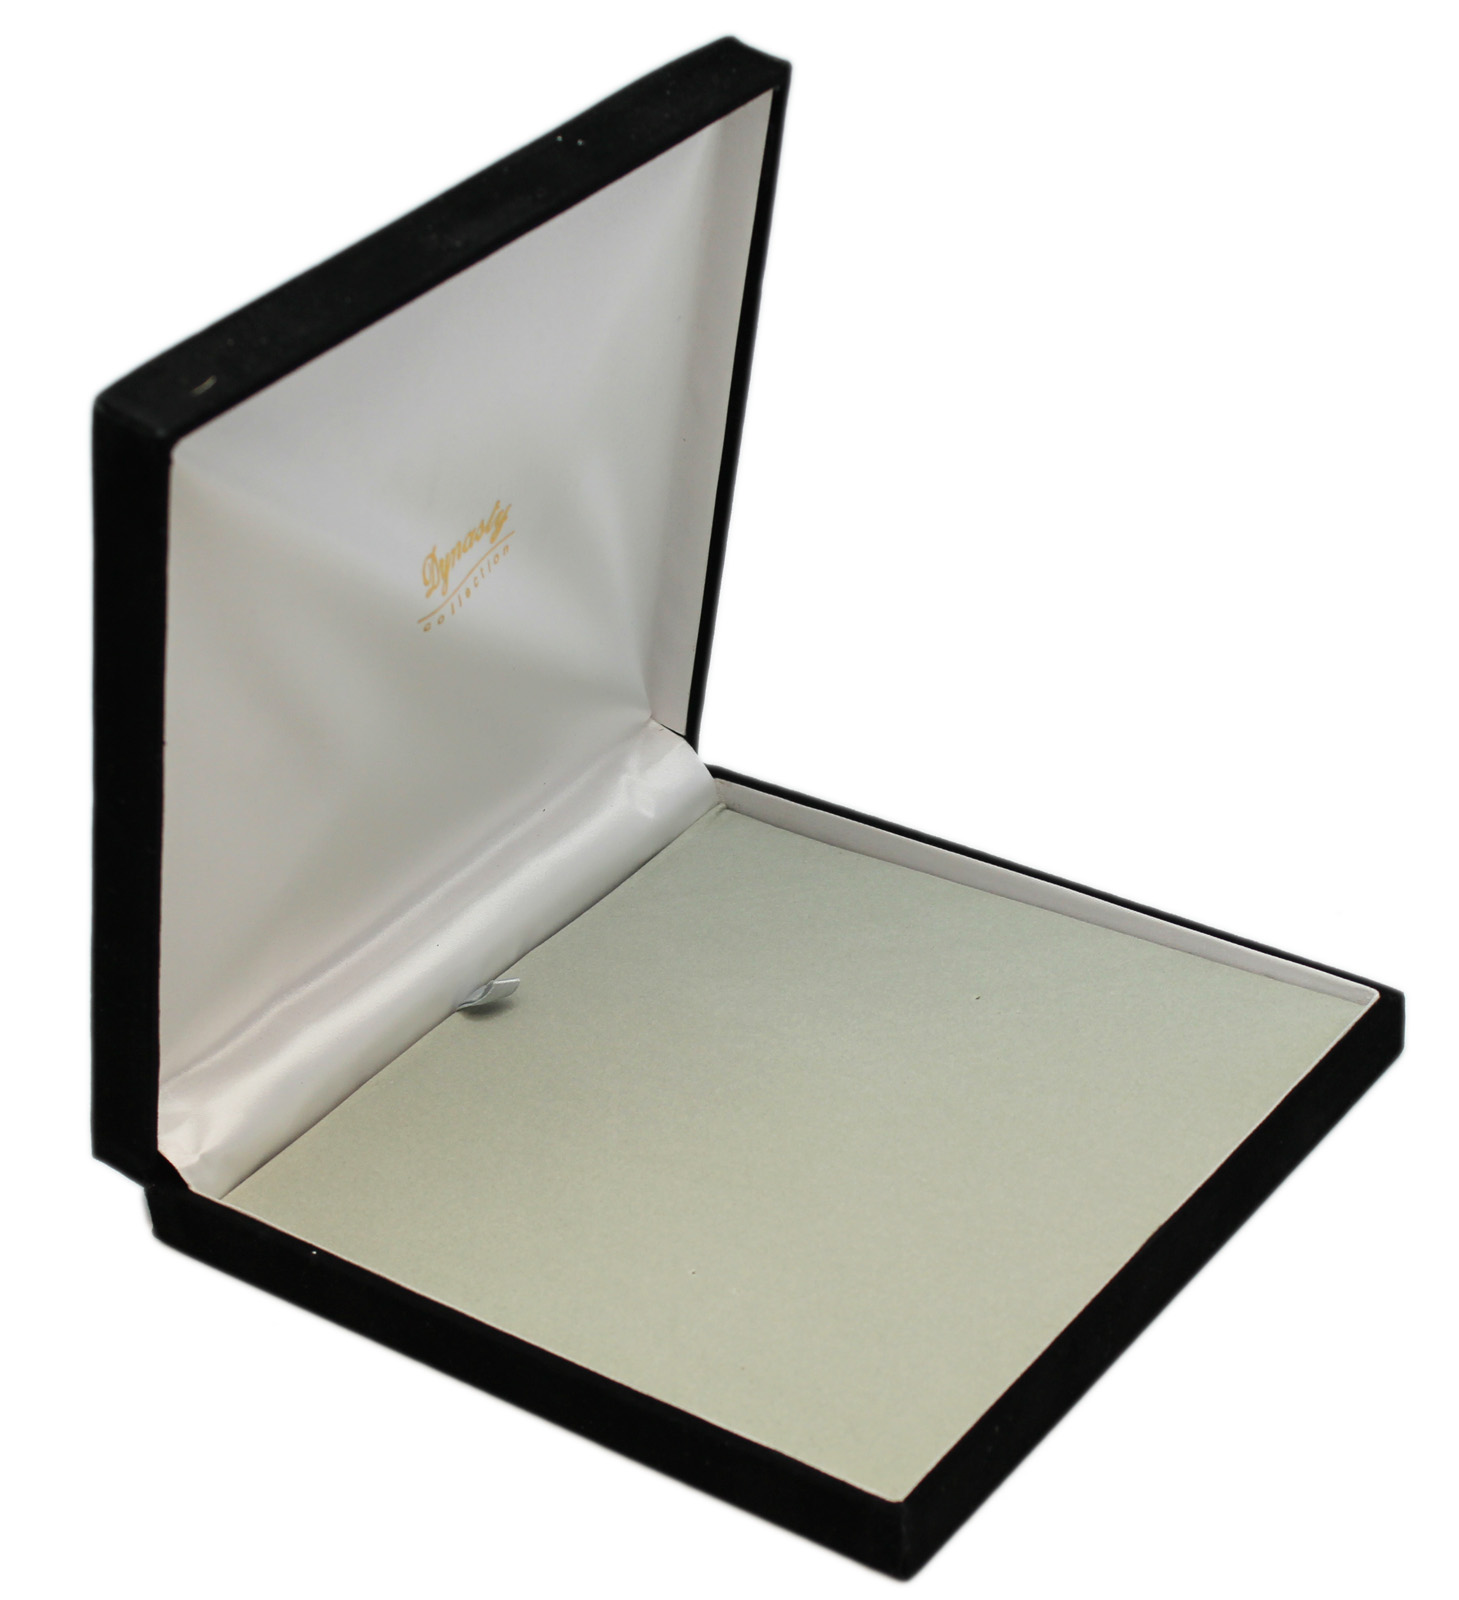 Black Velvet Jewelry Box - Extra Large 7-1/2 Inch Square